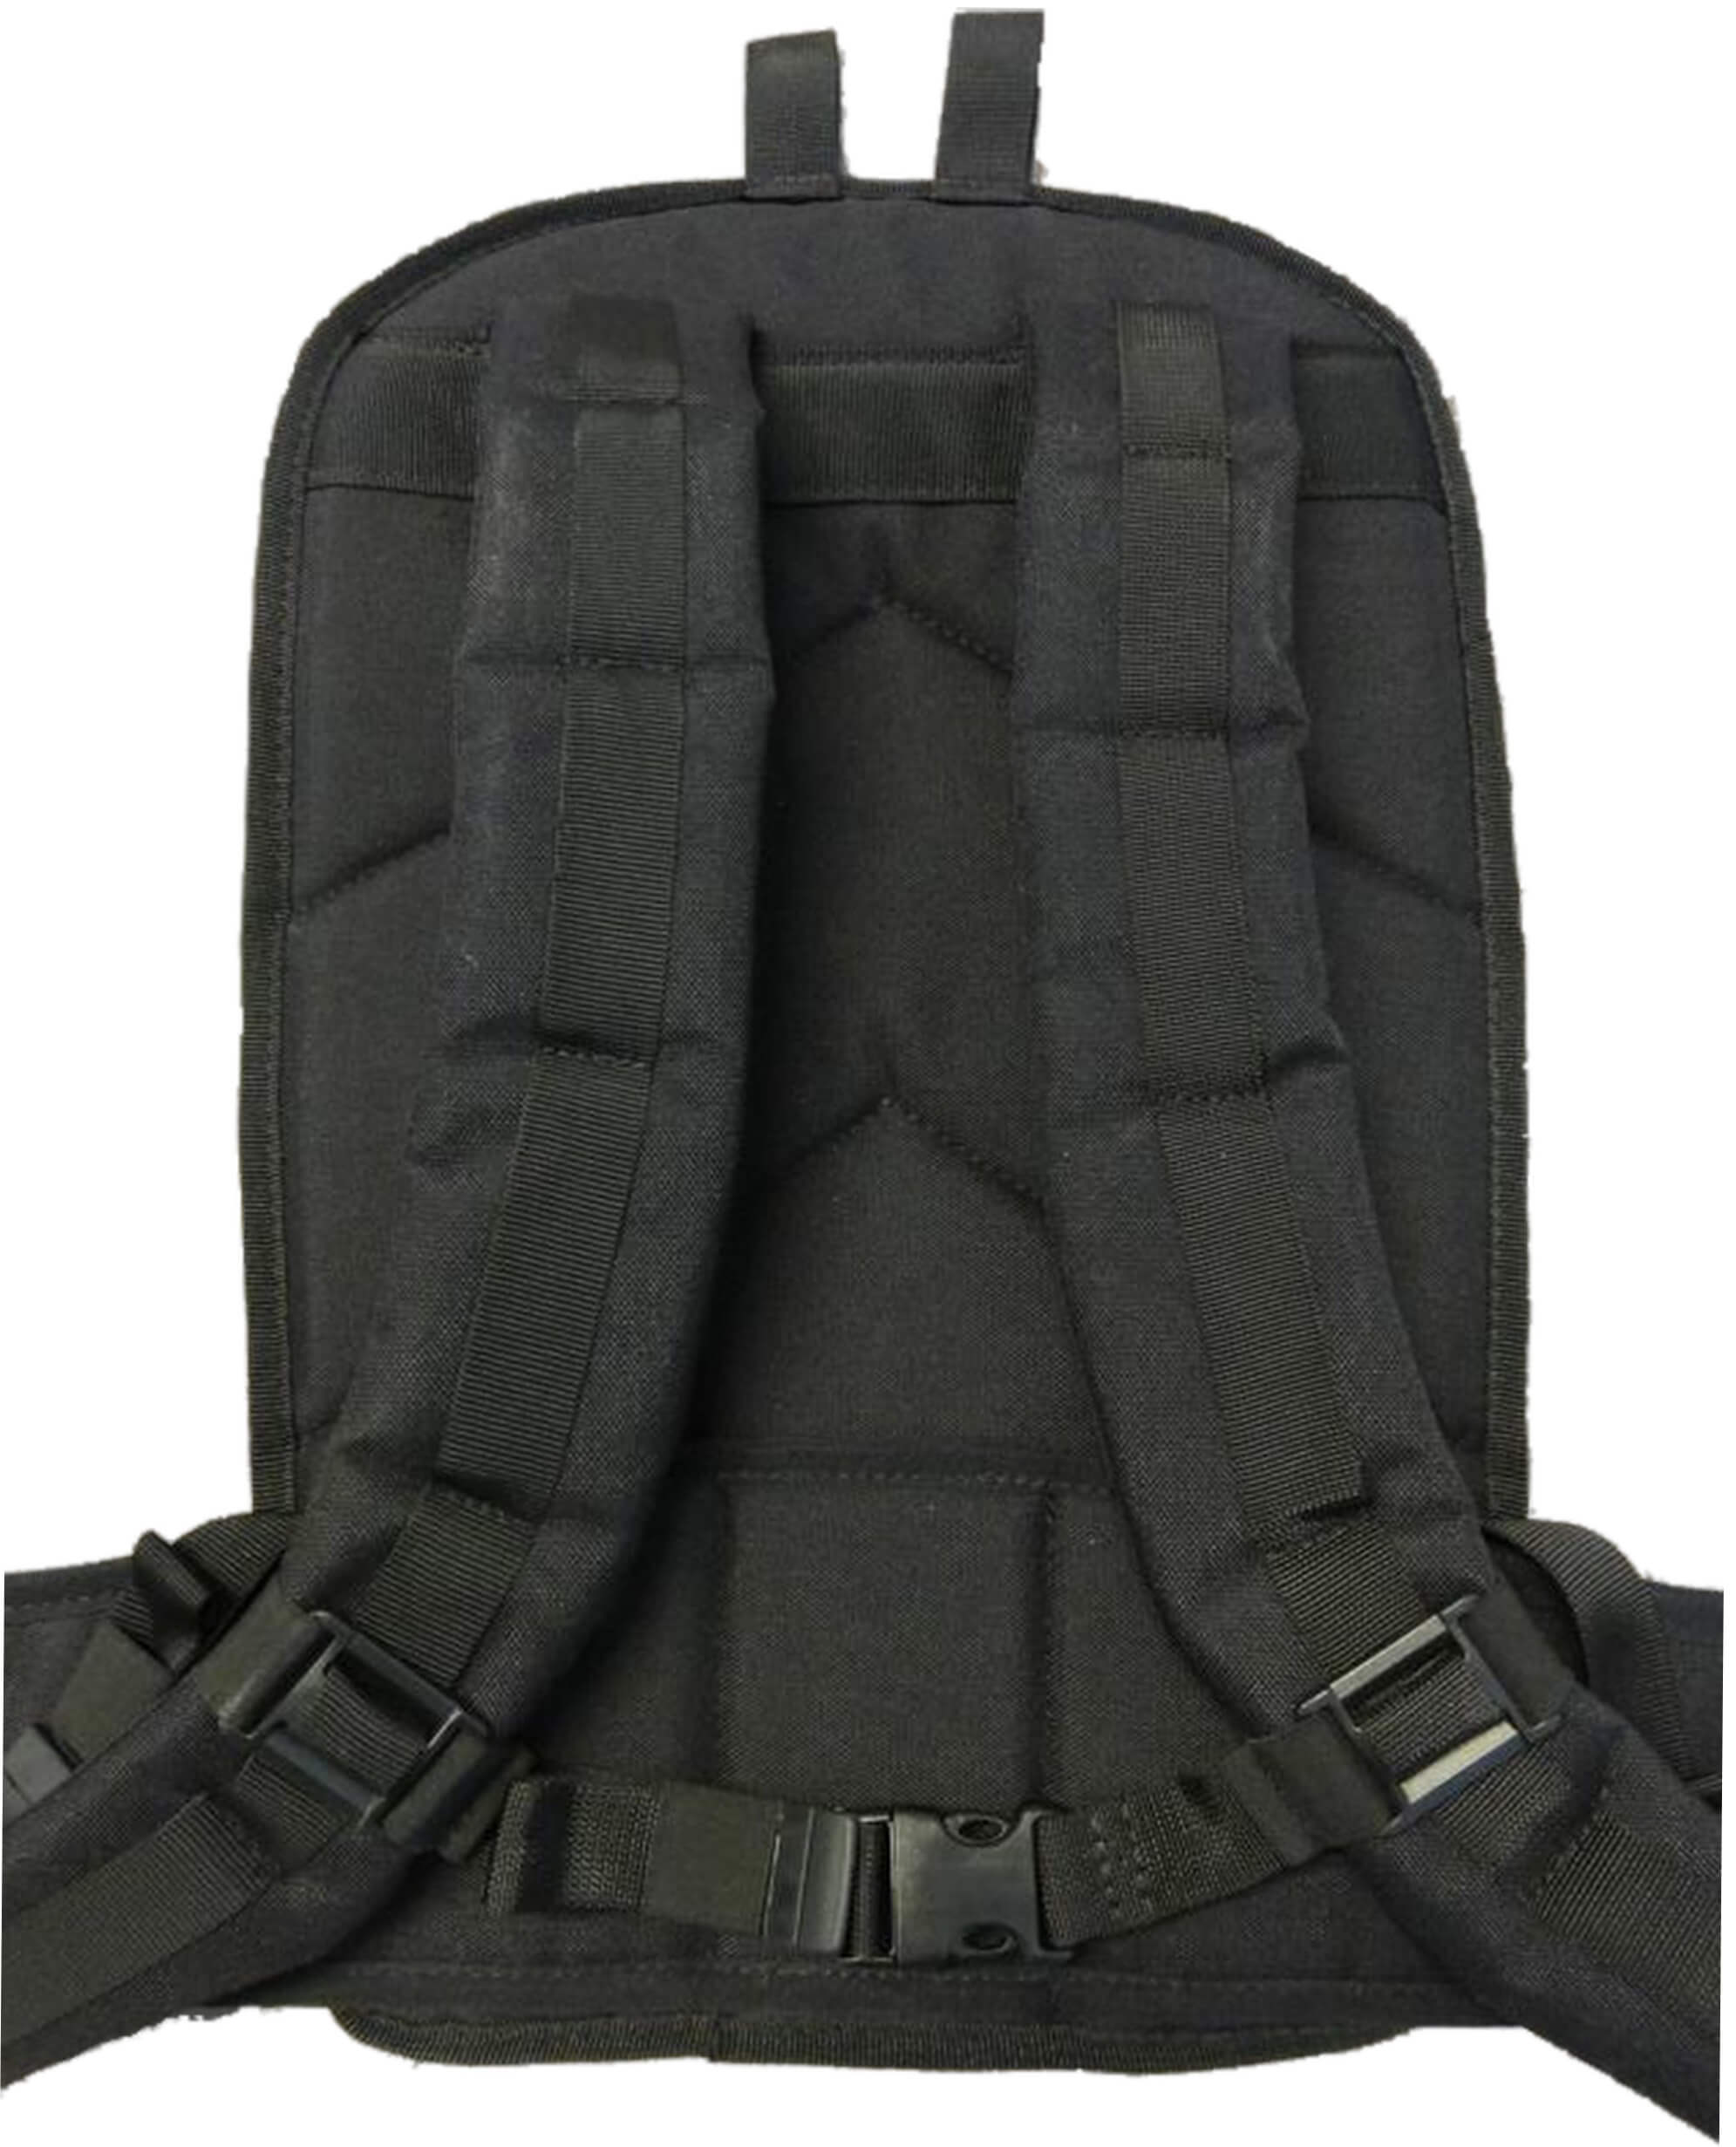 Chem-Lock® Comfort Harness for Mesto RS185